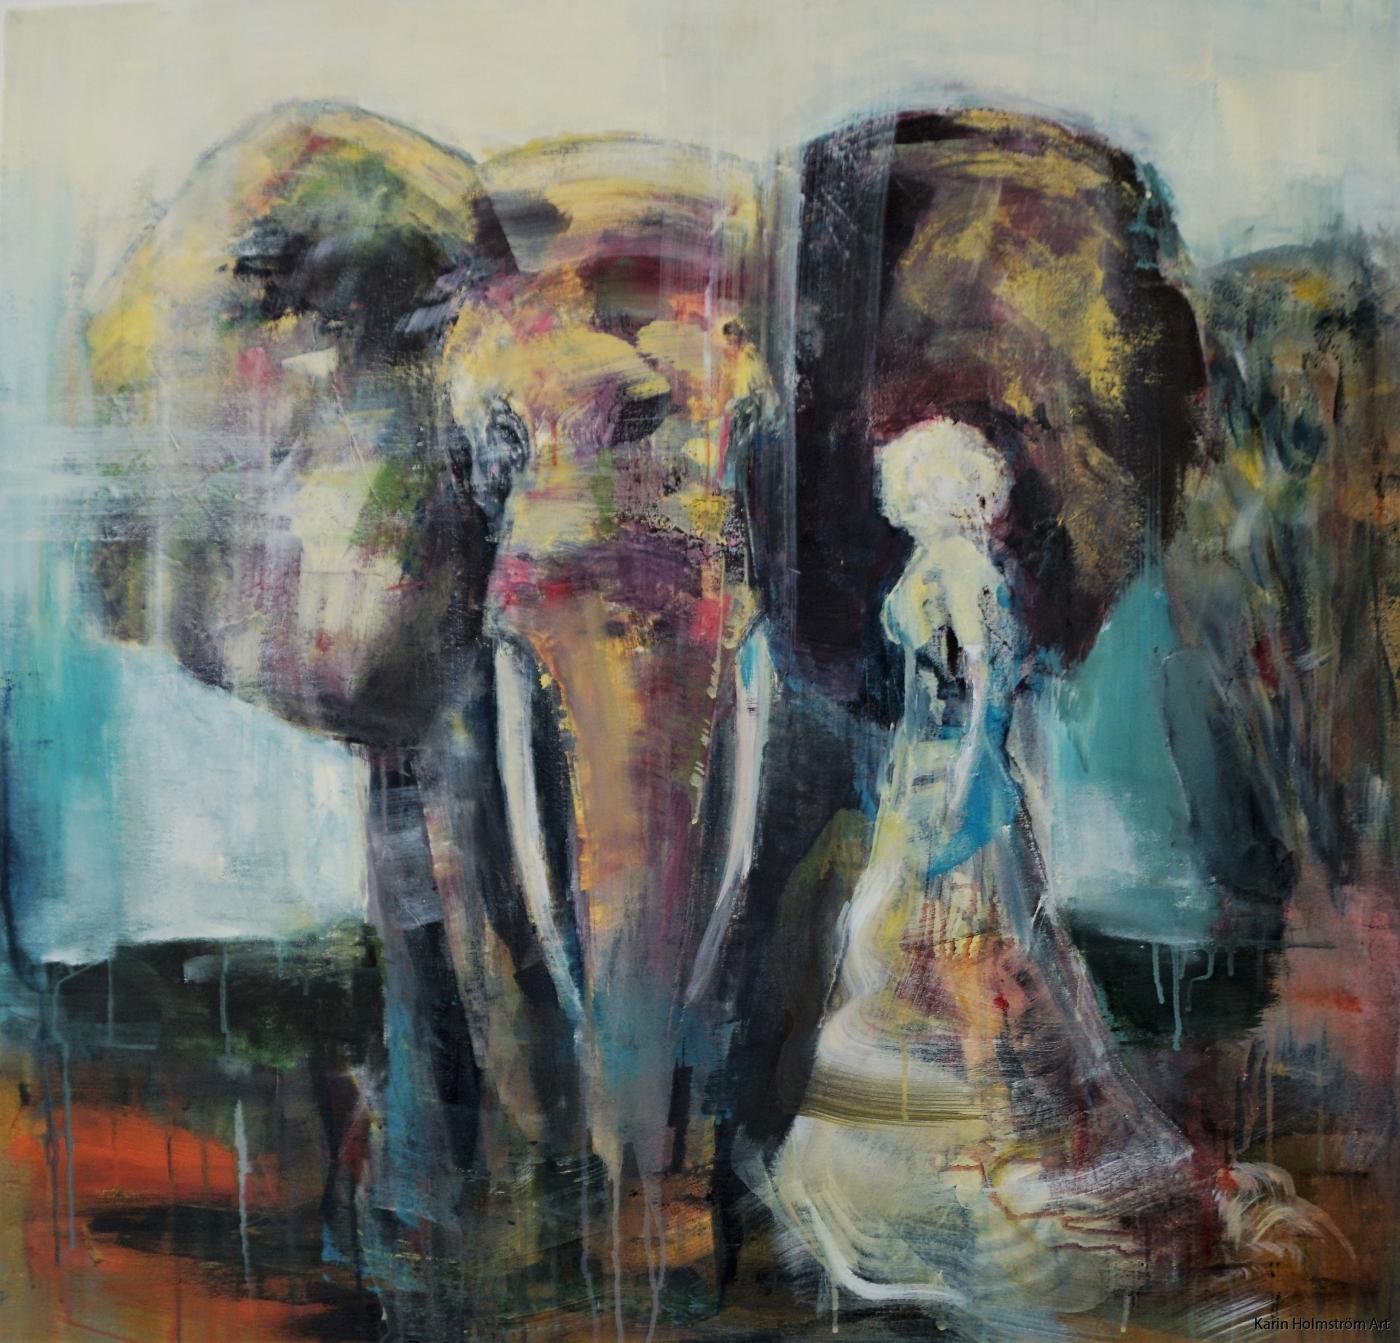 Walking with elephant bildyta ca 30x30 49ex